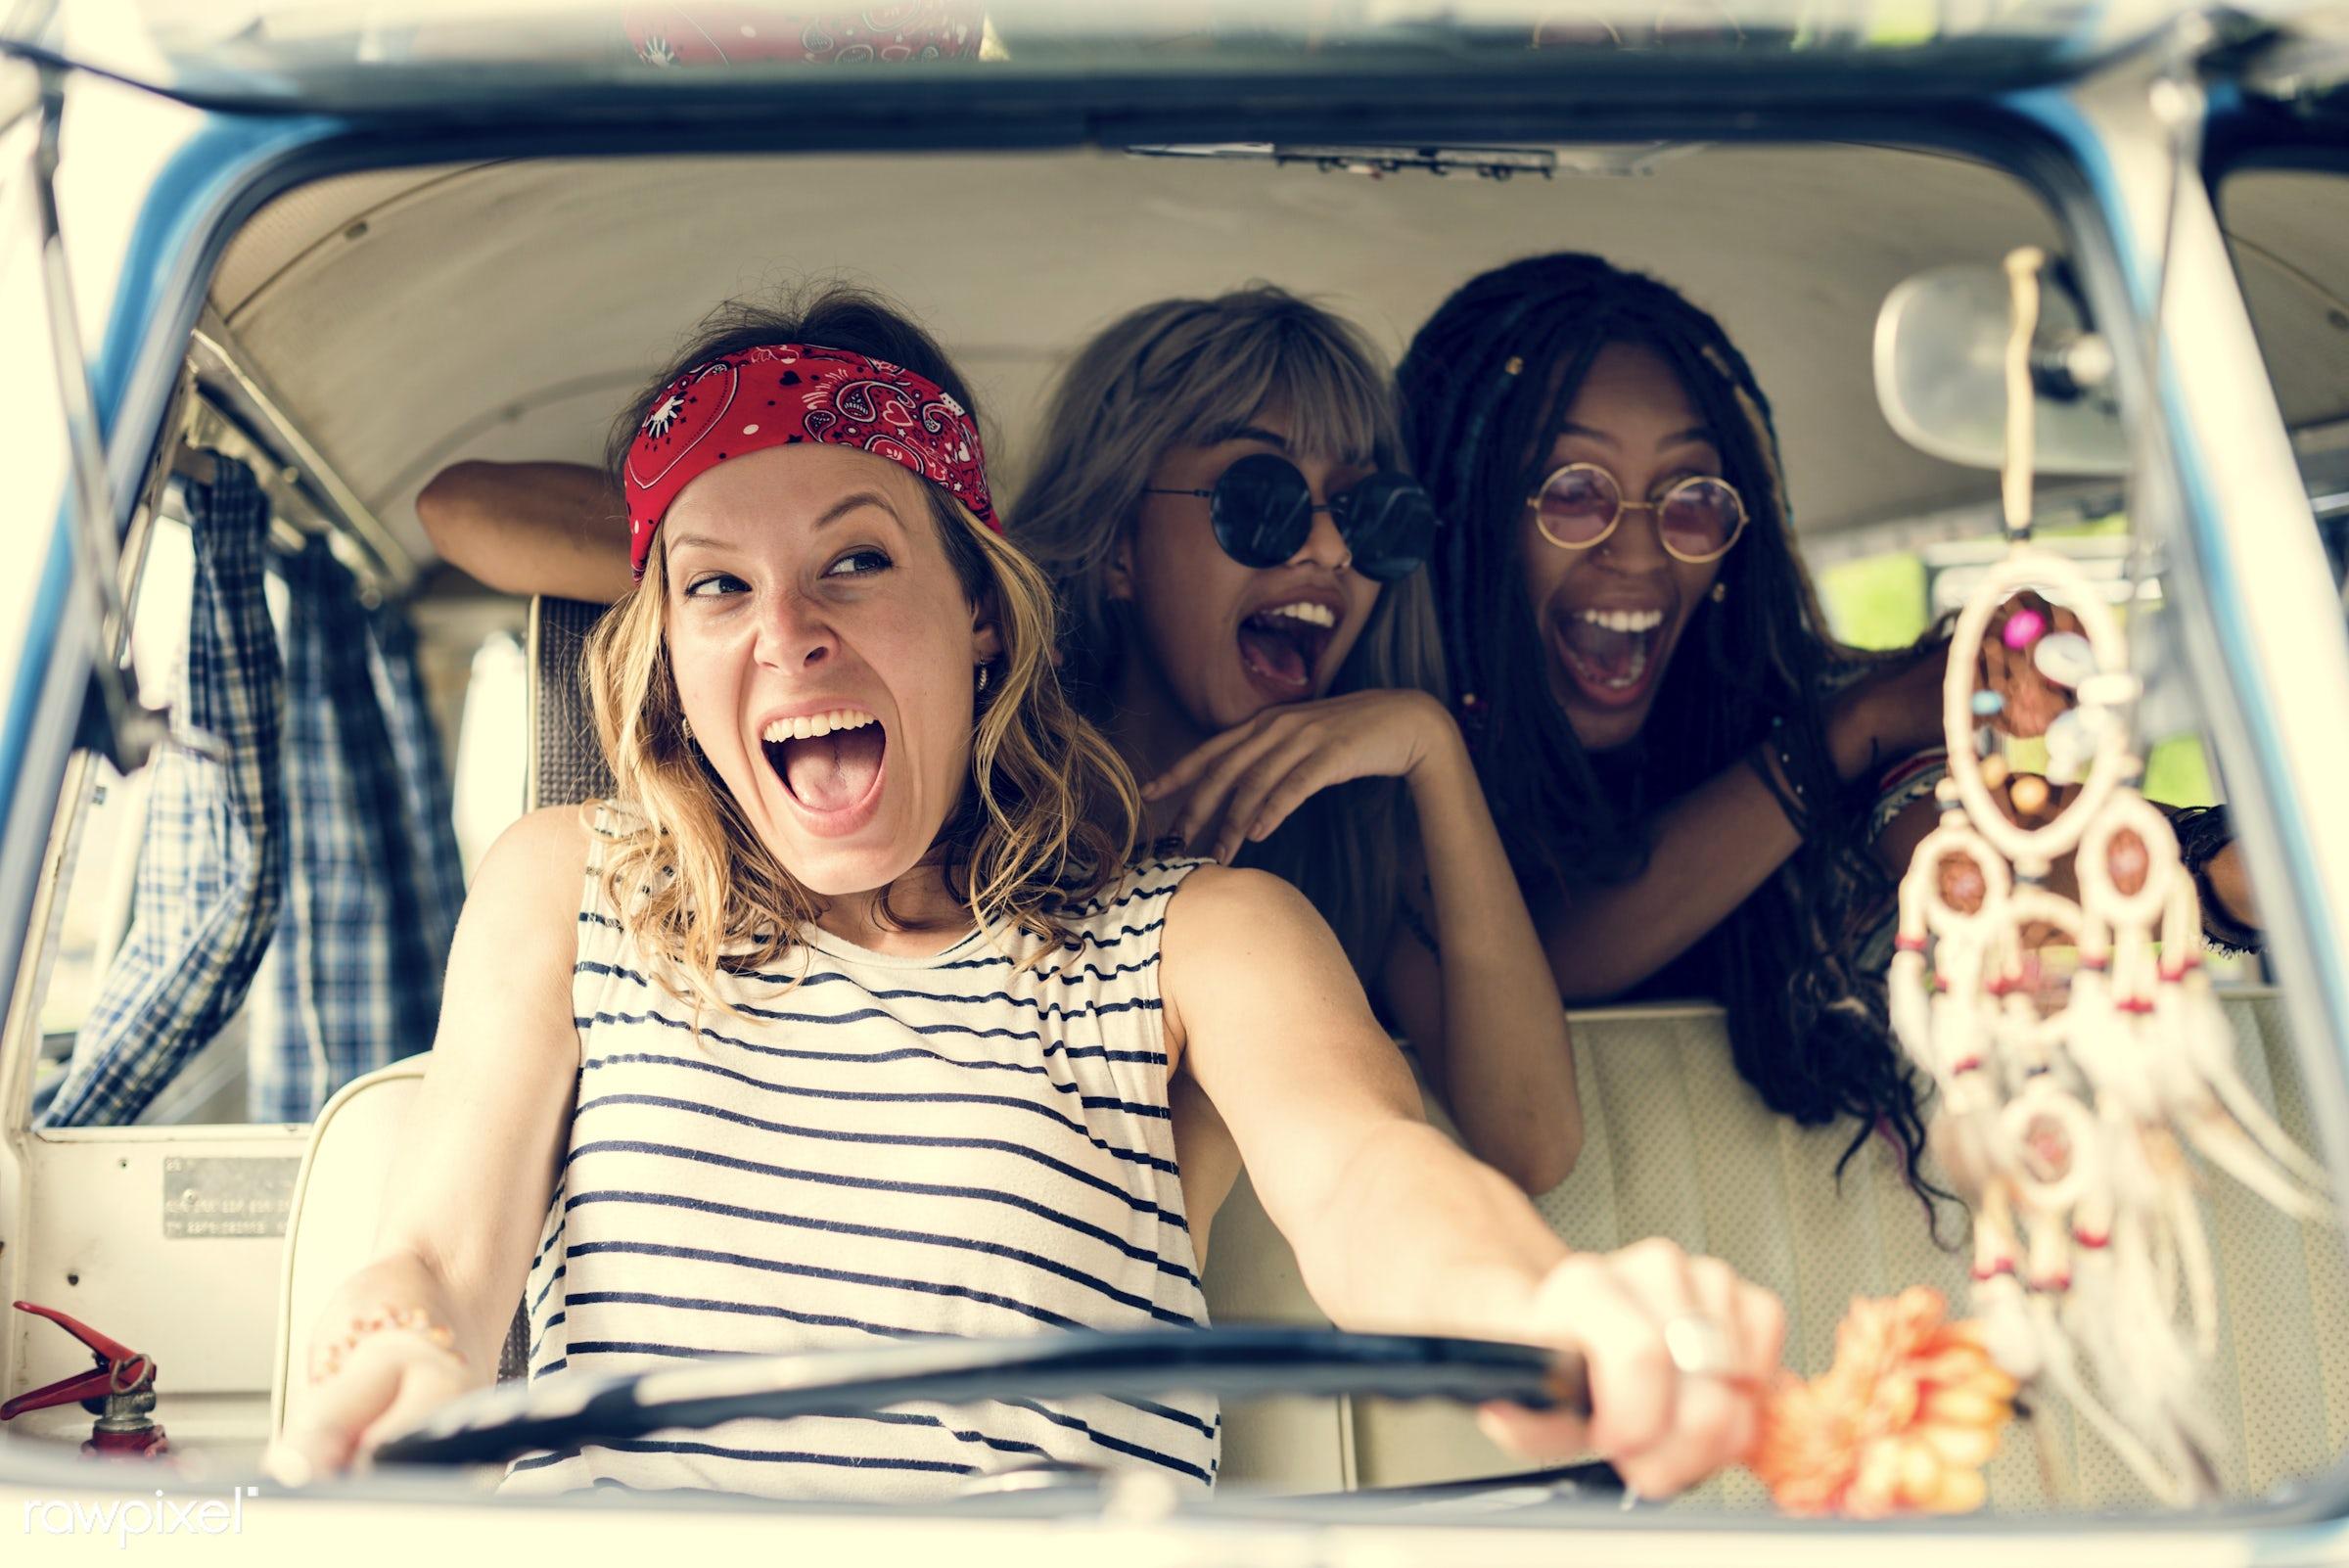 adult, comrade, confidant, confidante, crony, diversity, drive, driving, enjoyment, forever, friends, friendship, fun, group...